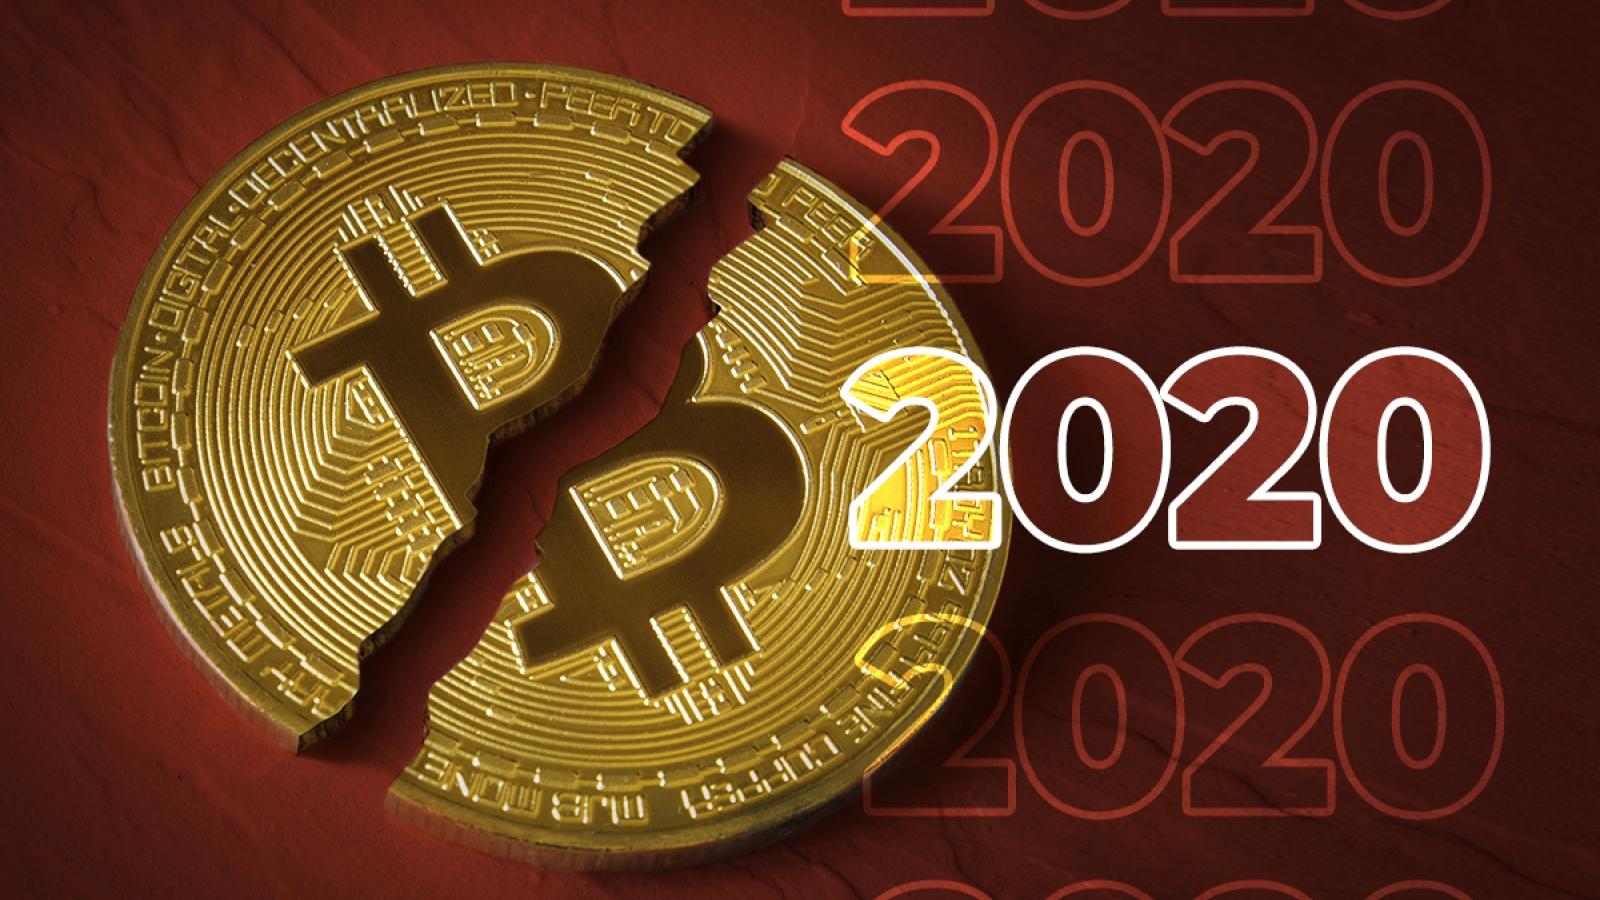 Bitcoin 2020 ralli btc